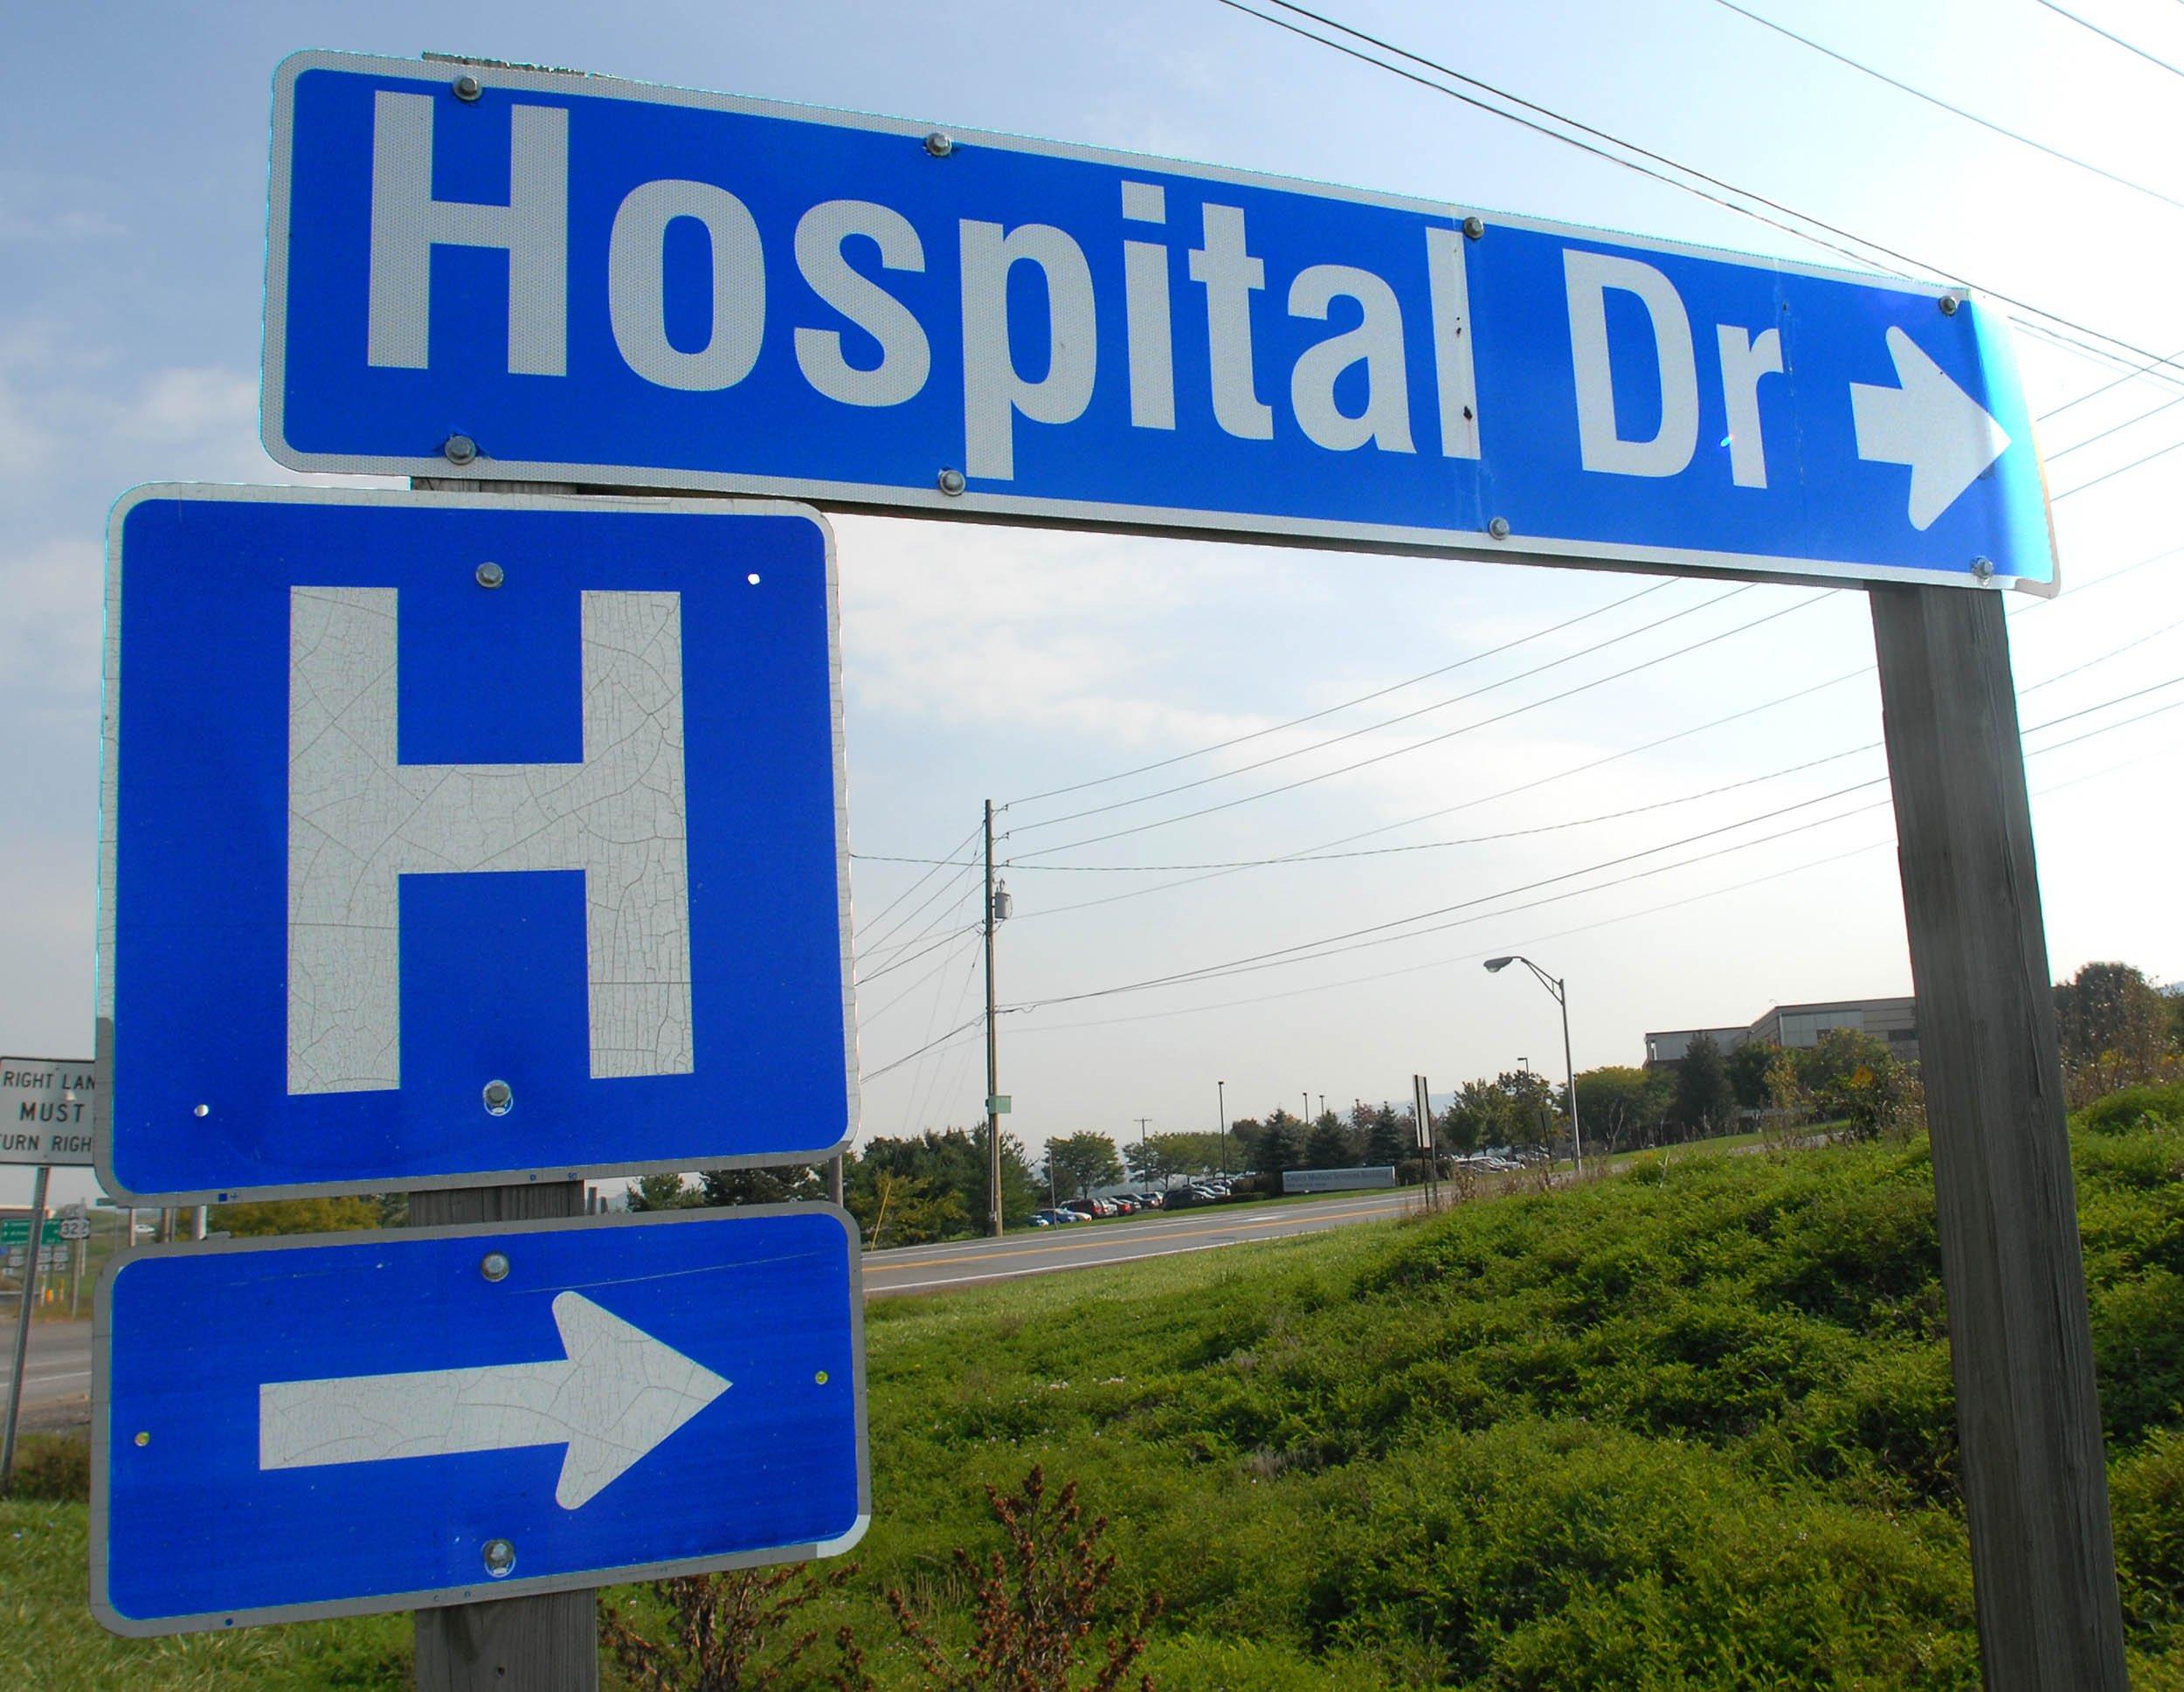 04_15_Hospital